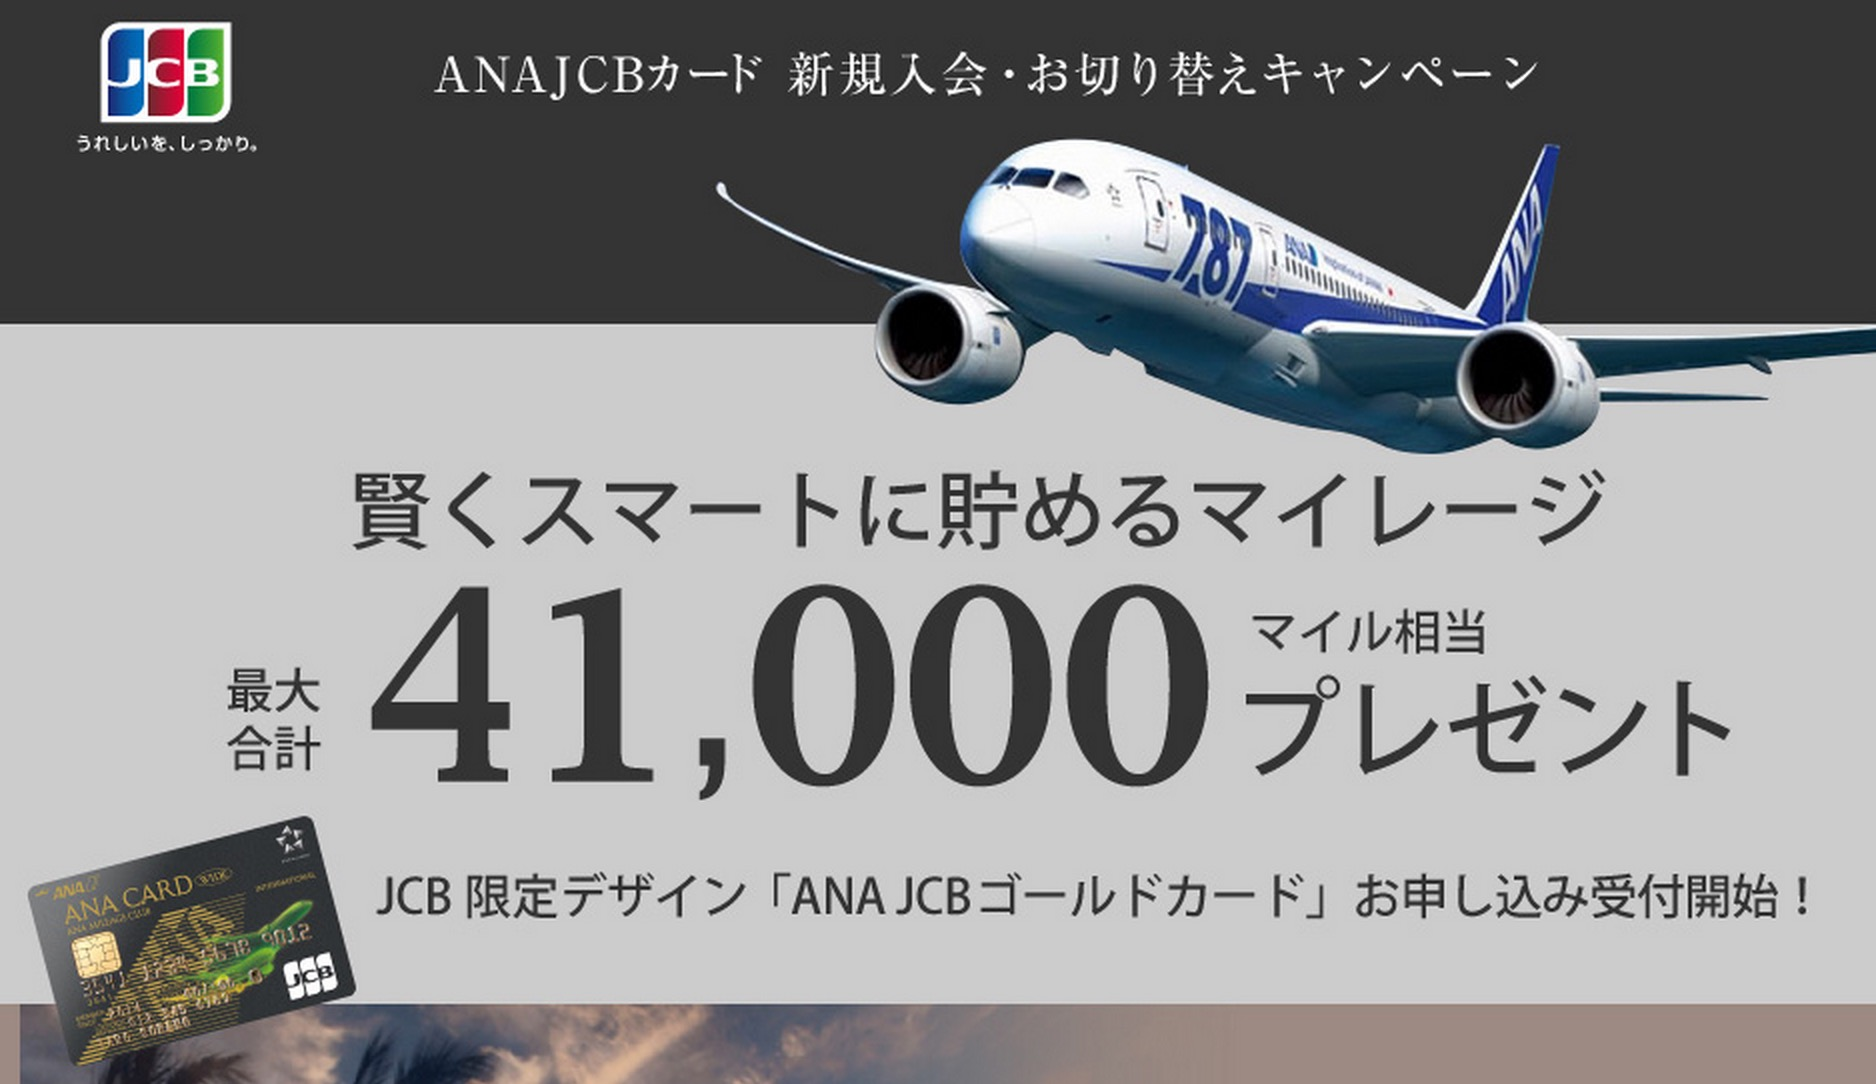 ANAカード30周年記念 限定ホログラムのJCBカードが受付開始!